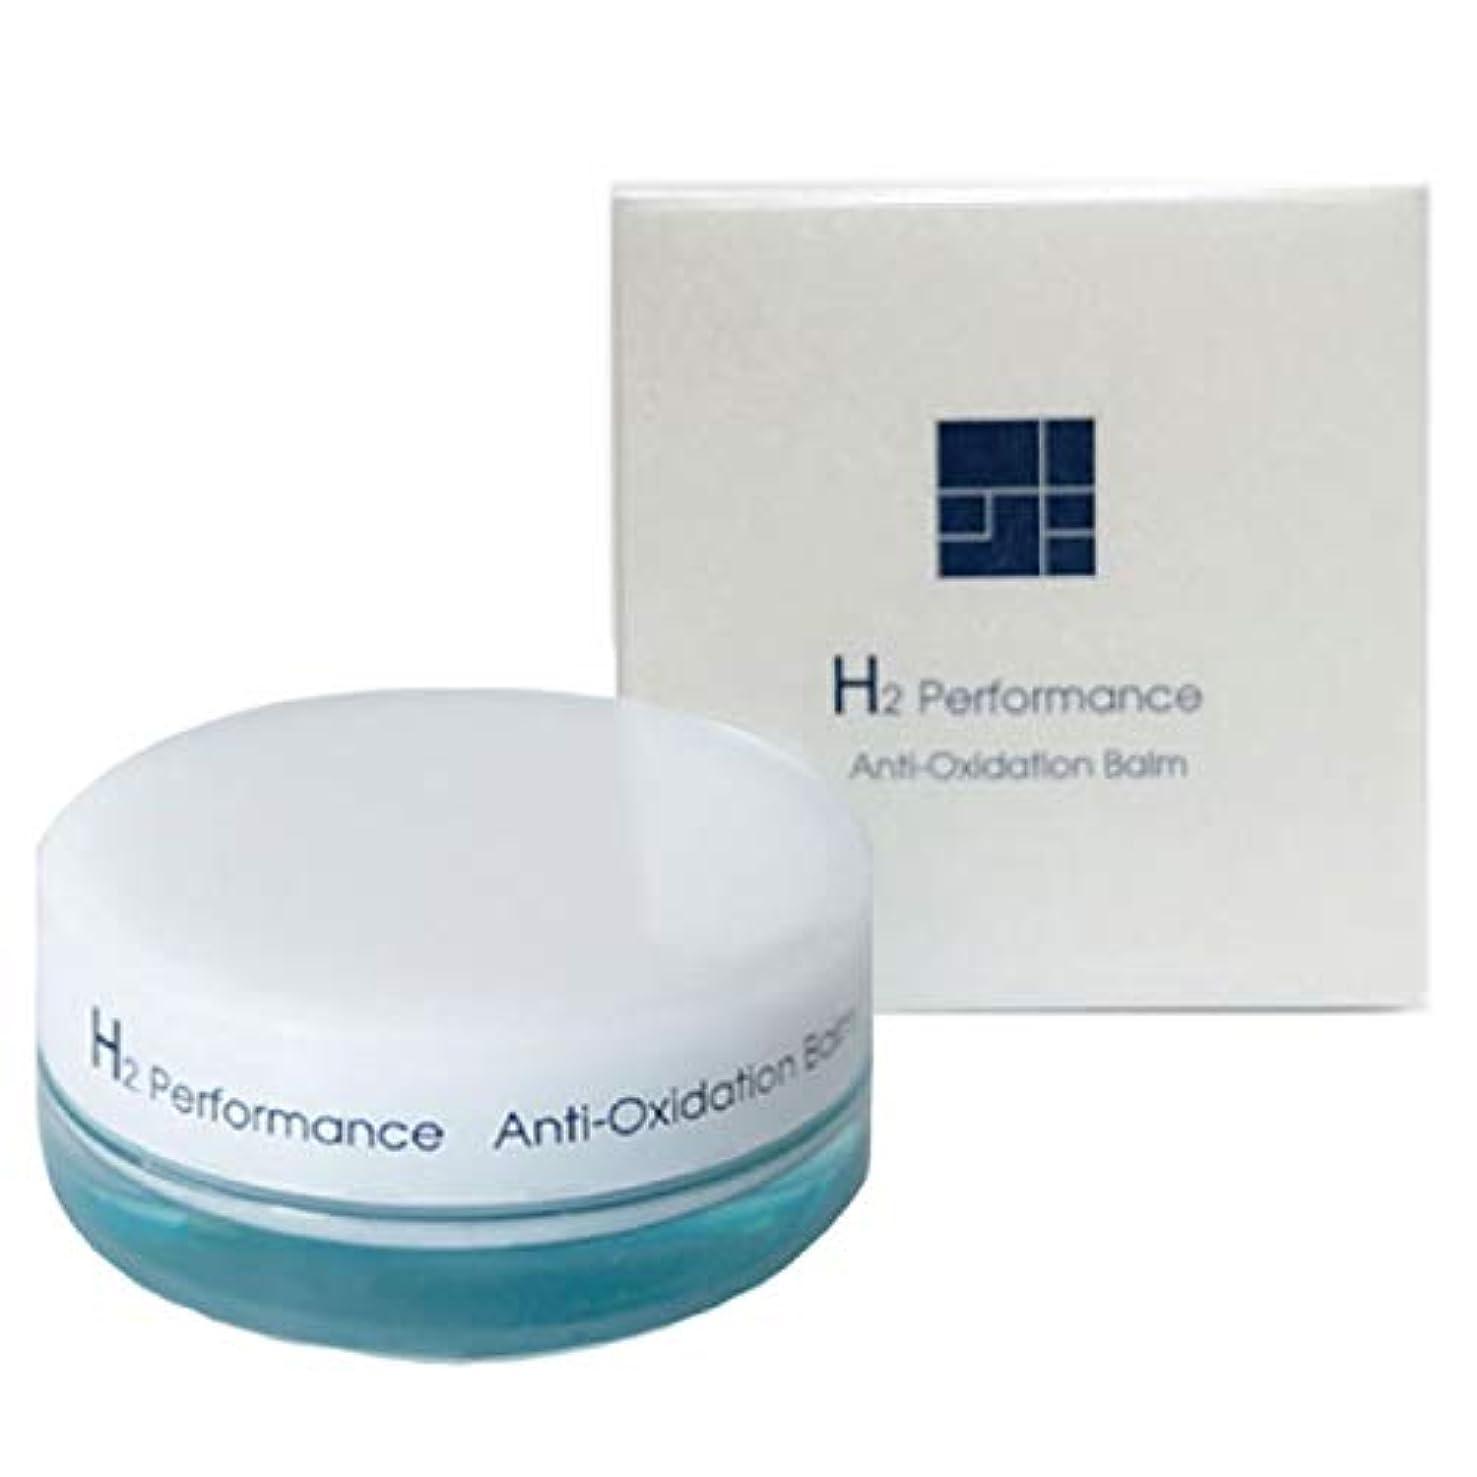 H2 Performance エイチツーパフォーマンス アンチオキシデイションバーム